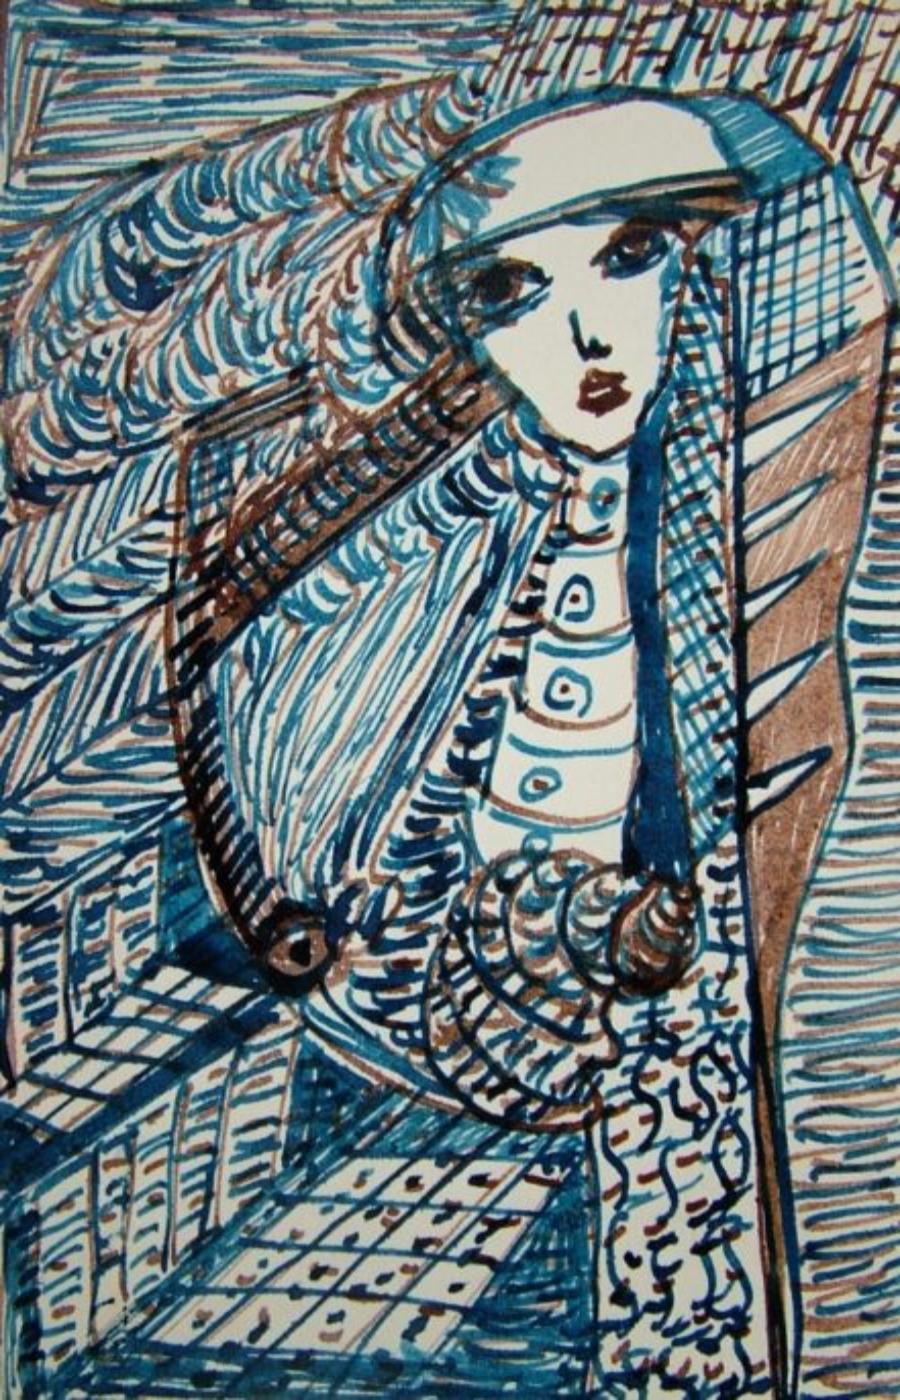 Madge Gill, arte en defensa propia.